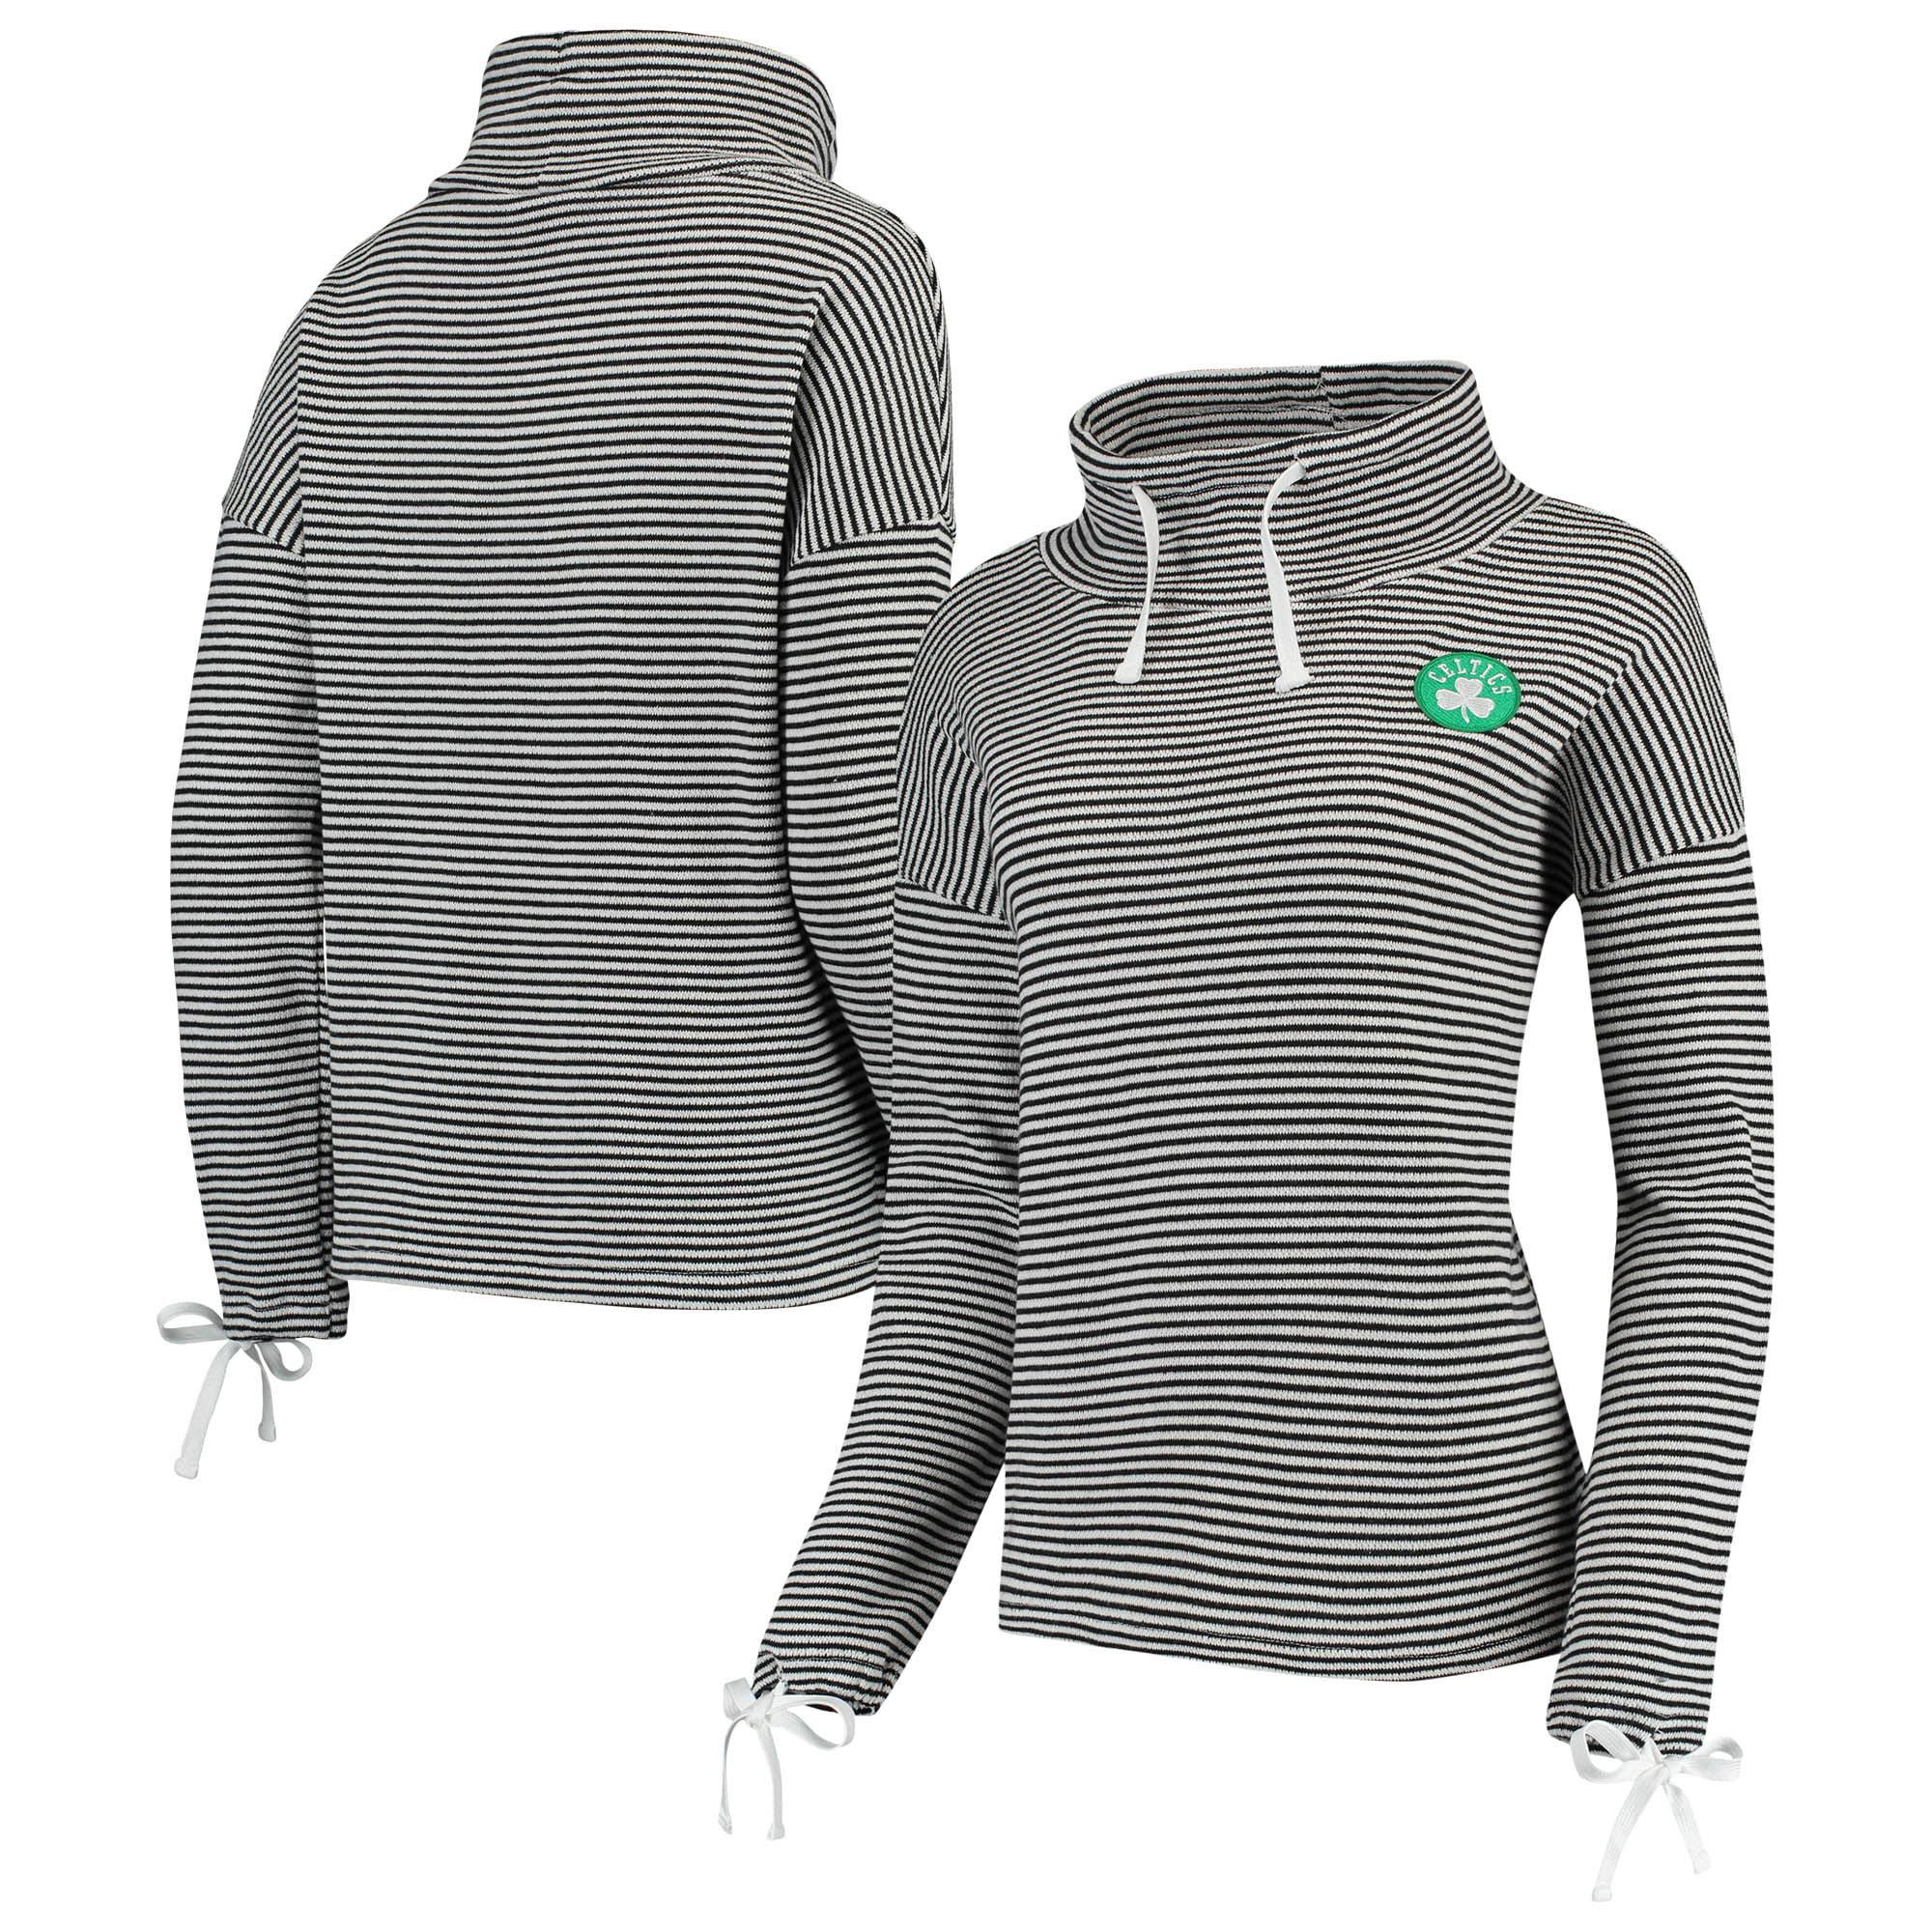 Boston Celtics Women's Sunday-Funday Funnel Neck Knit Shirt - Black